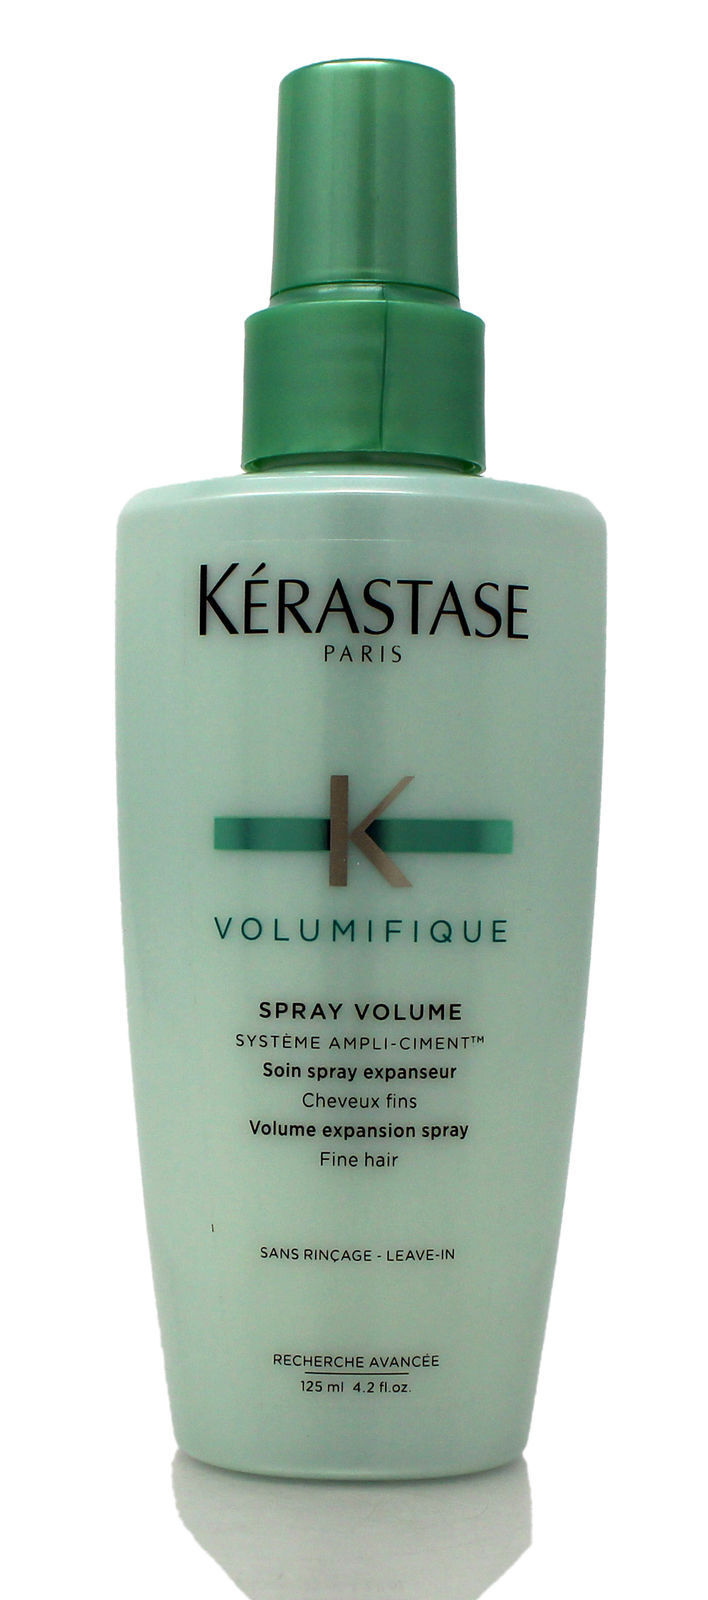 Resistance Volumifique Volume Expansion Spray  - 125ml/4.2oz